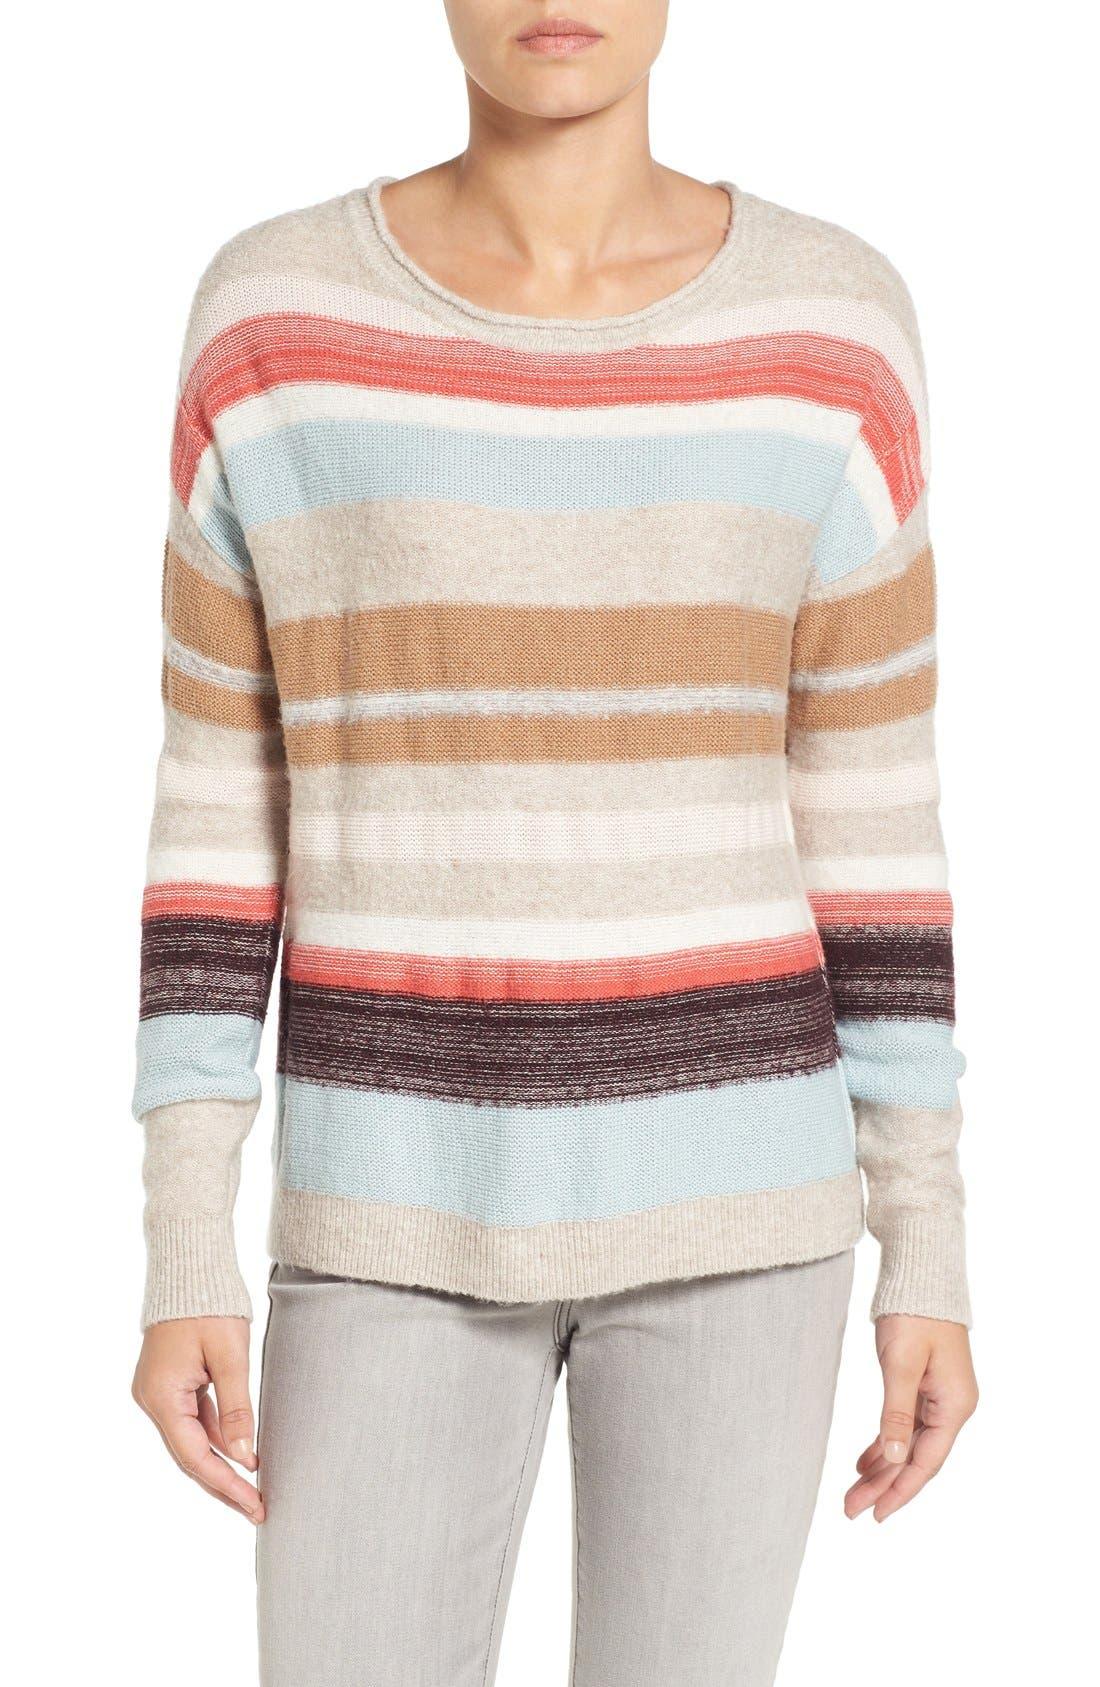 Alternate Image 1 Selected - Caslon® Back Button Stripe Knit Sweater (Regular & Petite)